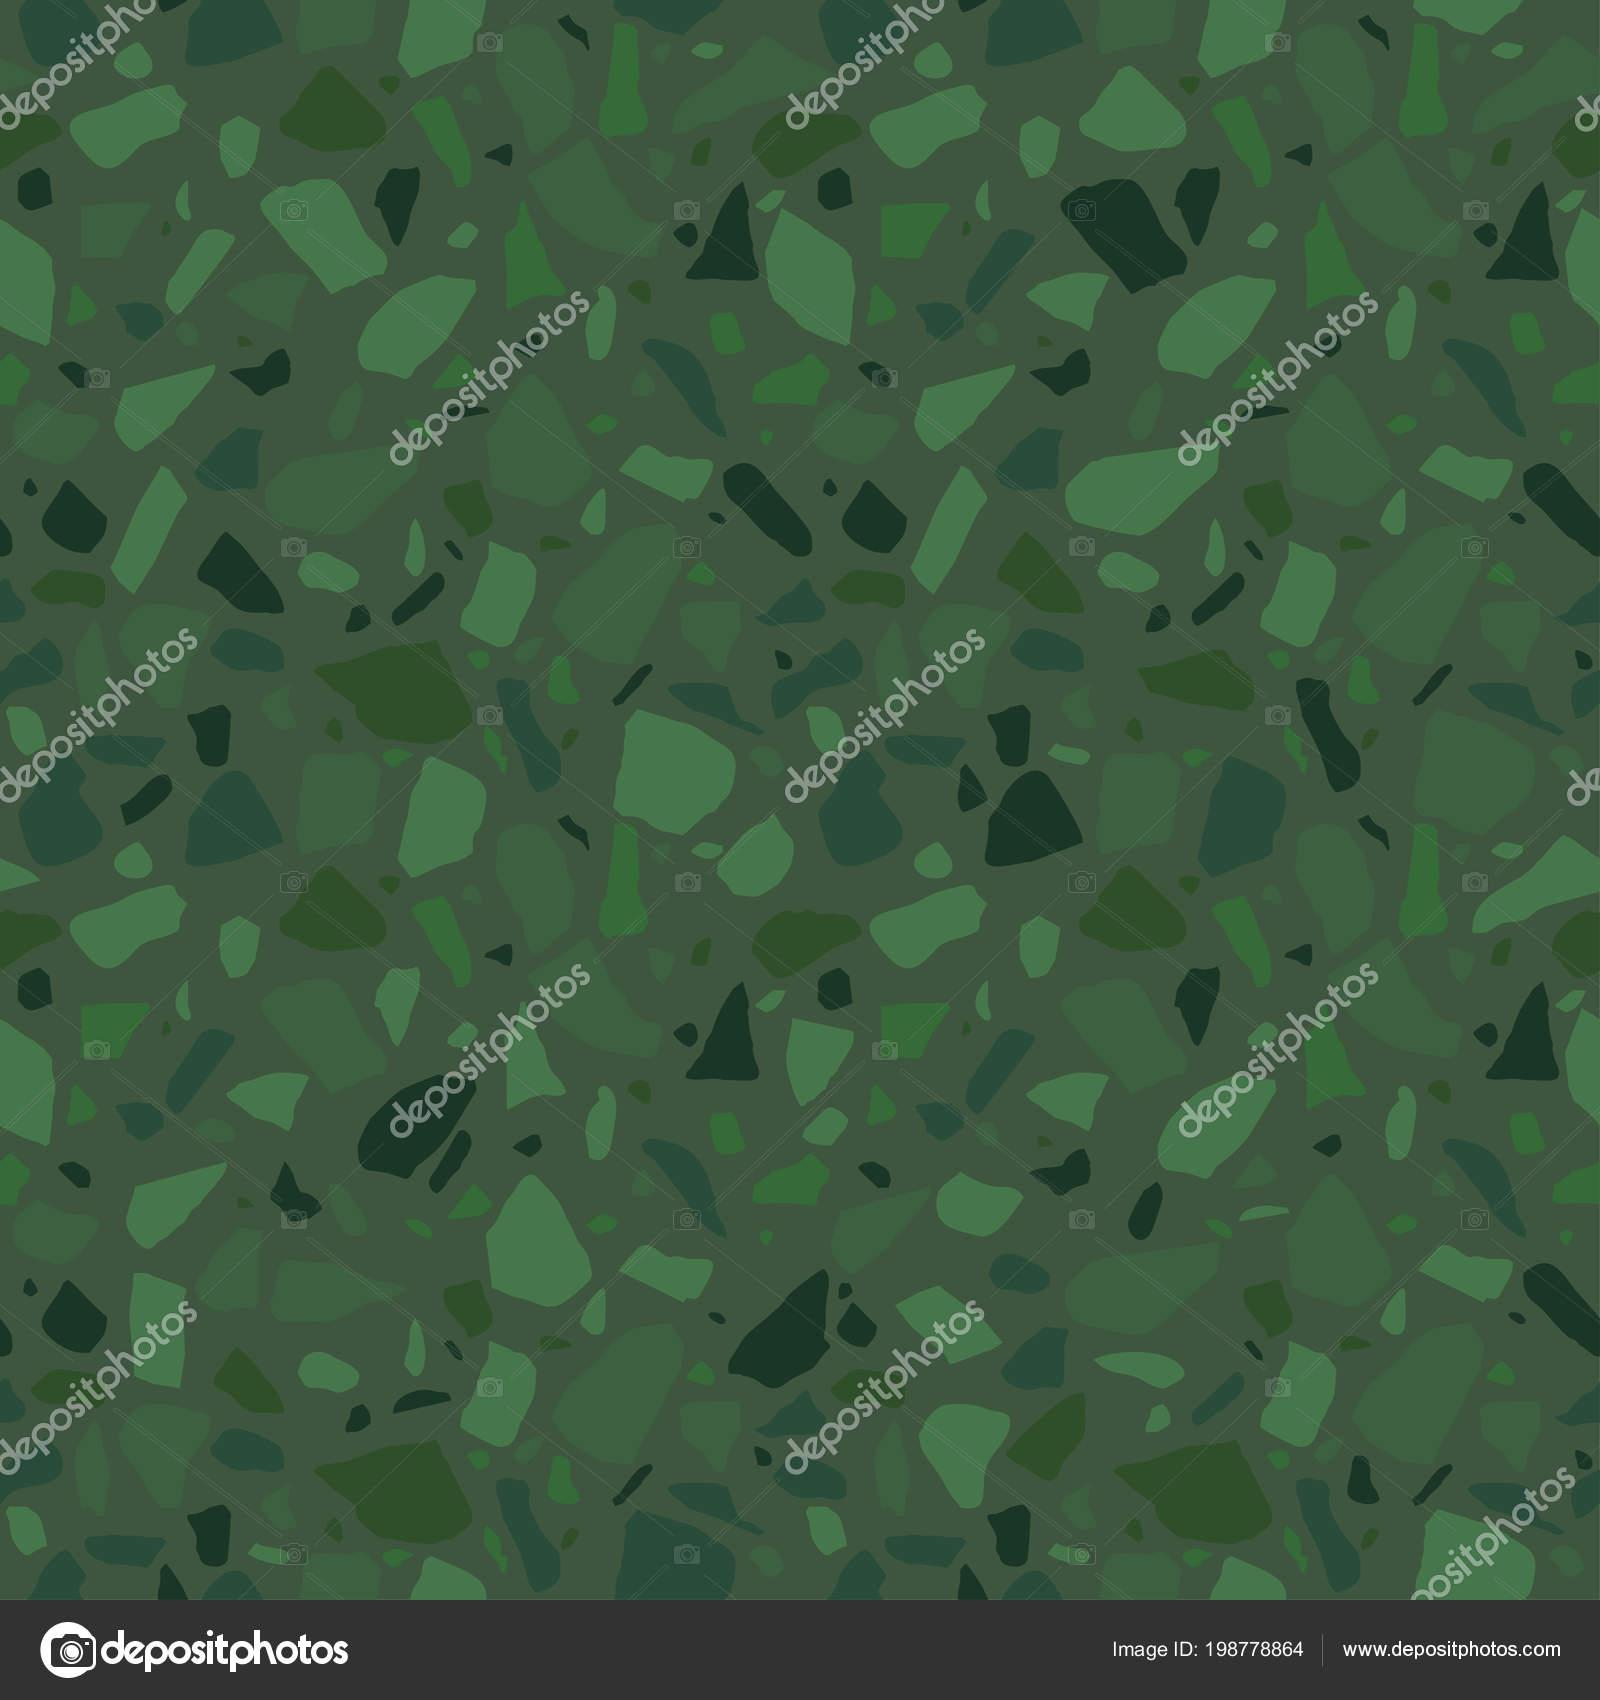 Terrazzo Seamless Pattern Surface Texture Decorative Granite Tiles Stone Colored Stock Vector